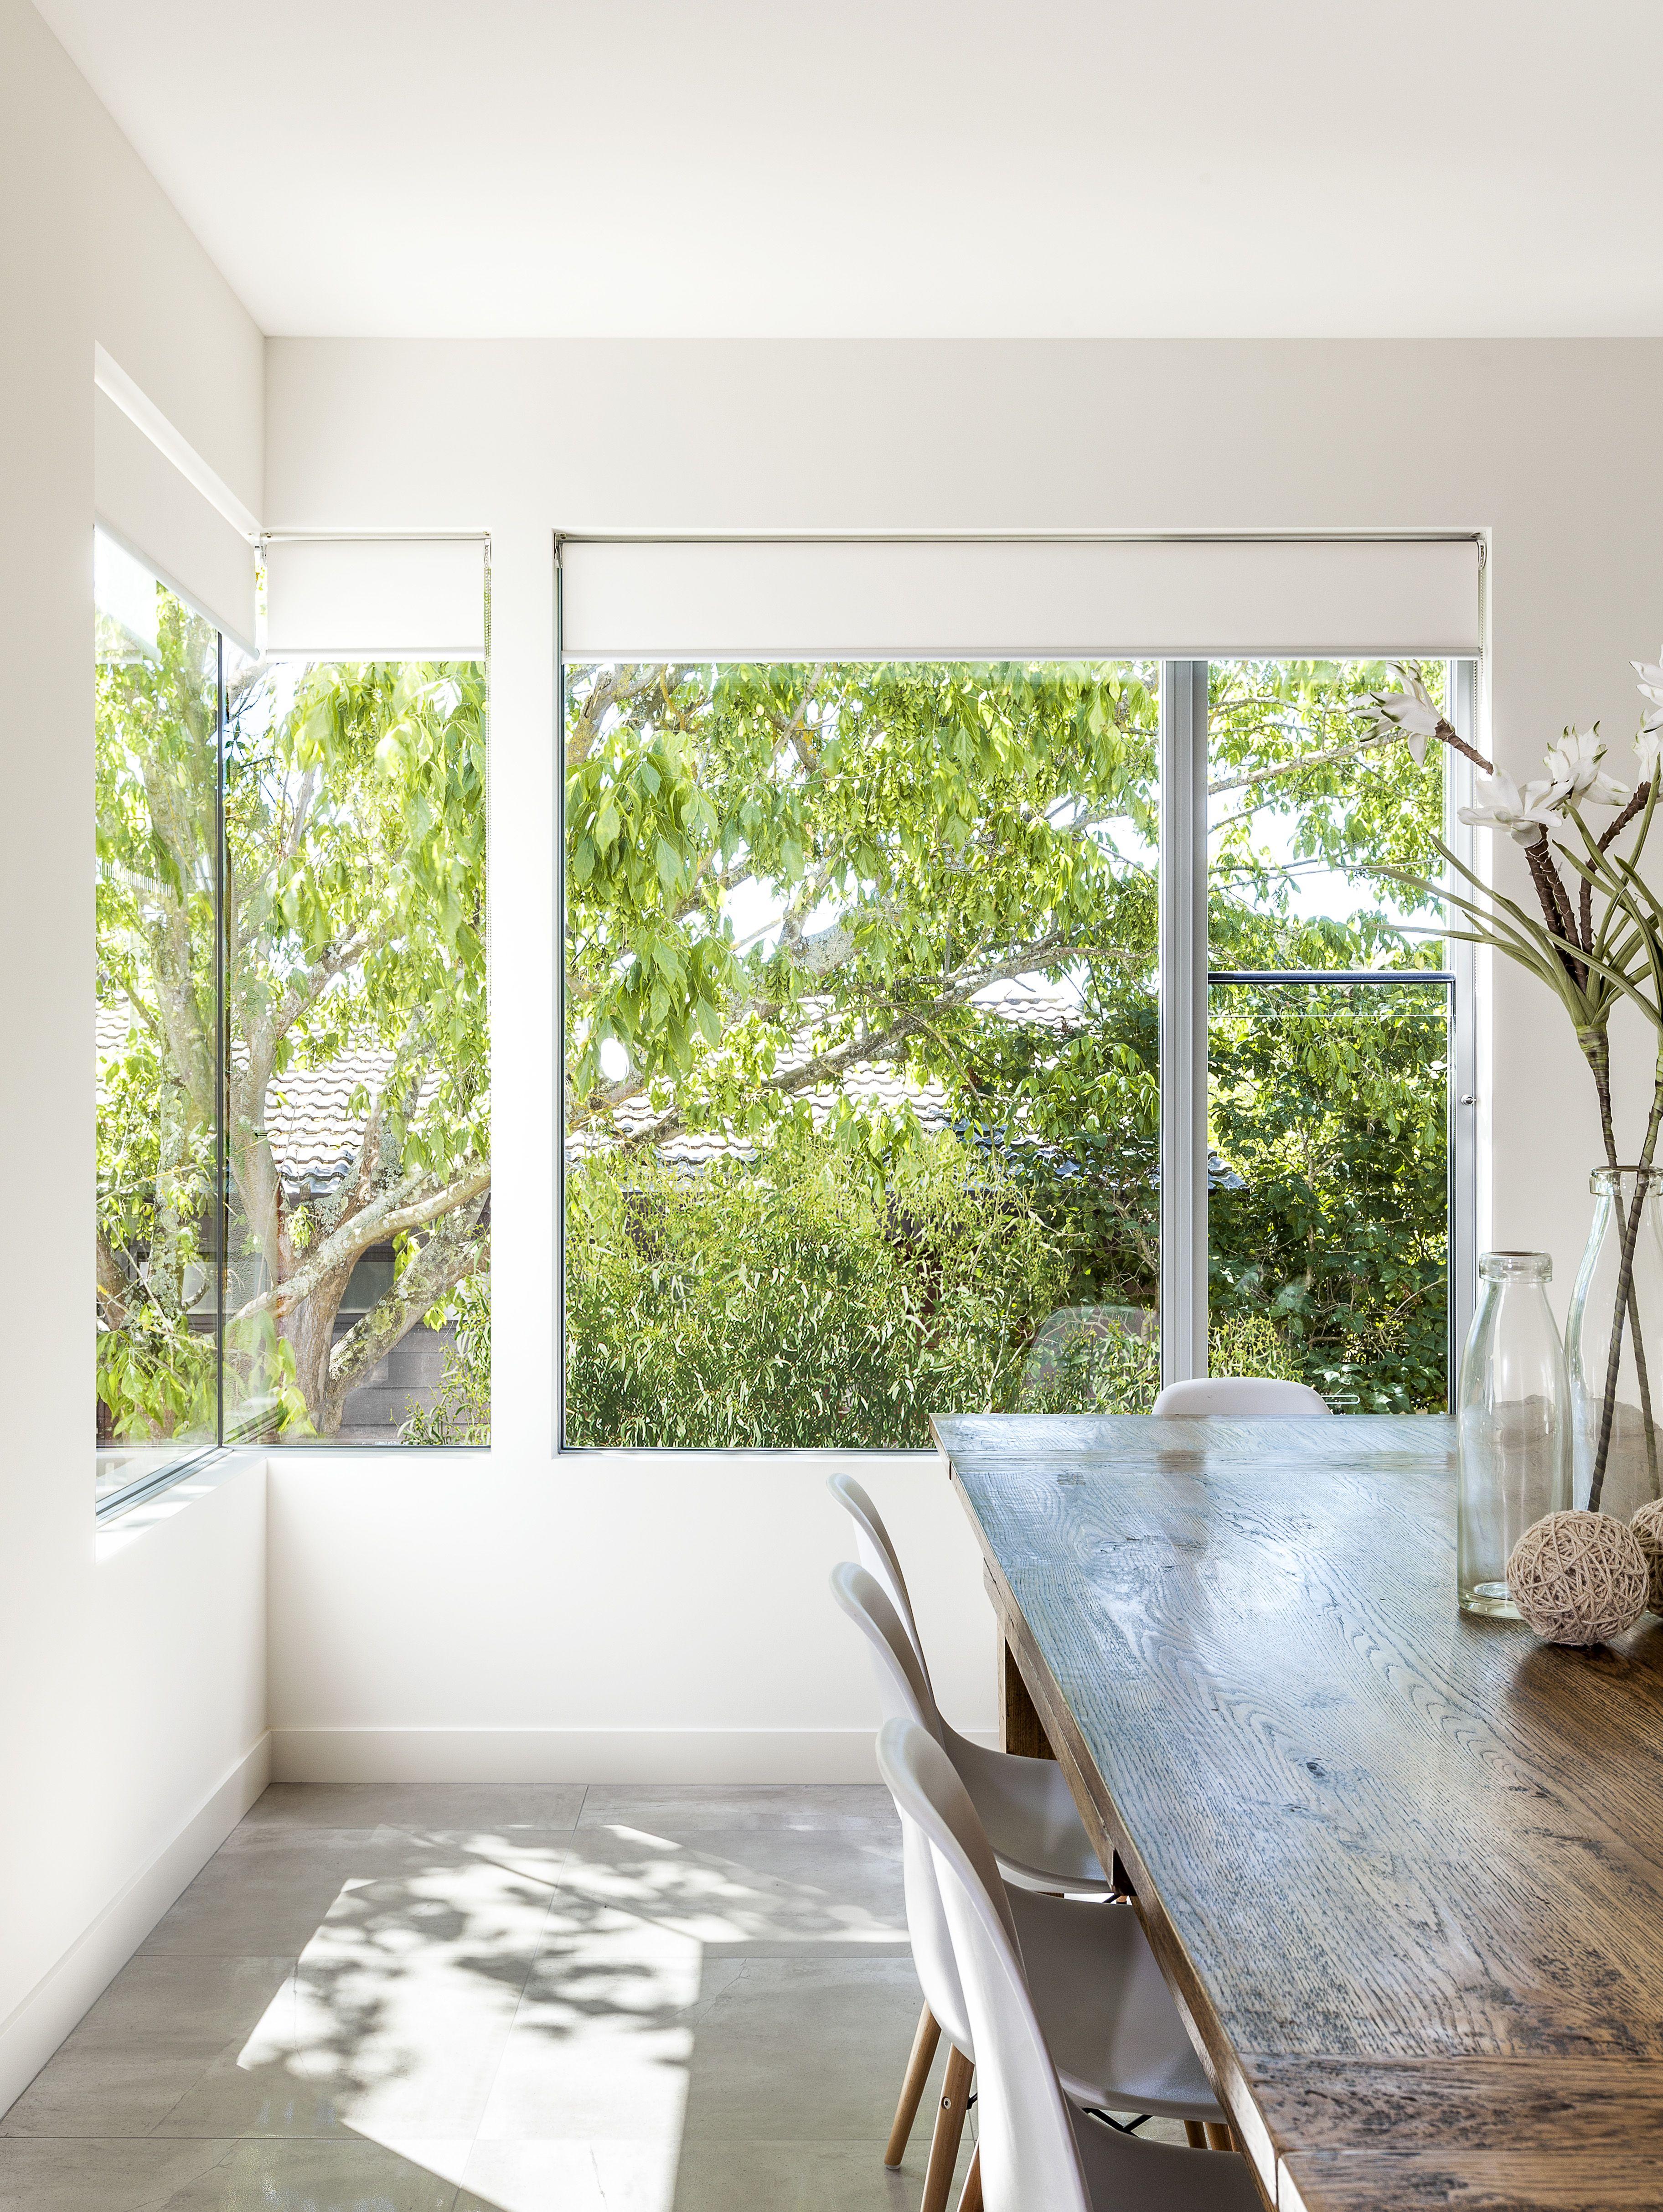 A L Sashless Aluminium Windows And Corner Window Frameless Sashes Create A Modern Minimalist Look Minimalist Window Window Design House Window Design